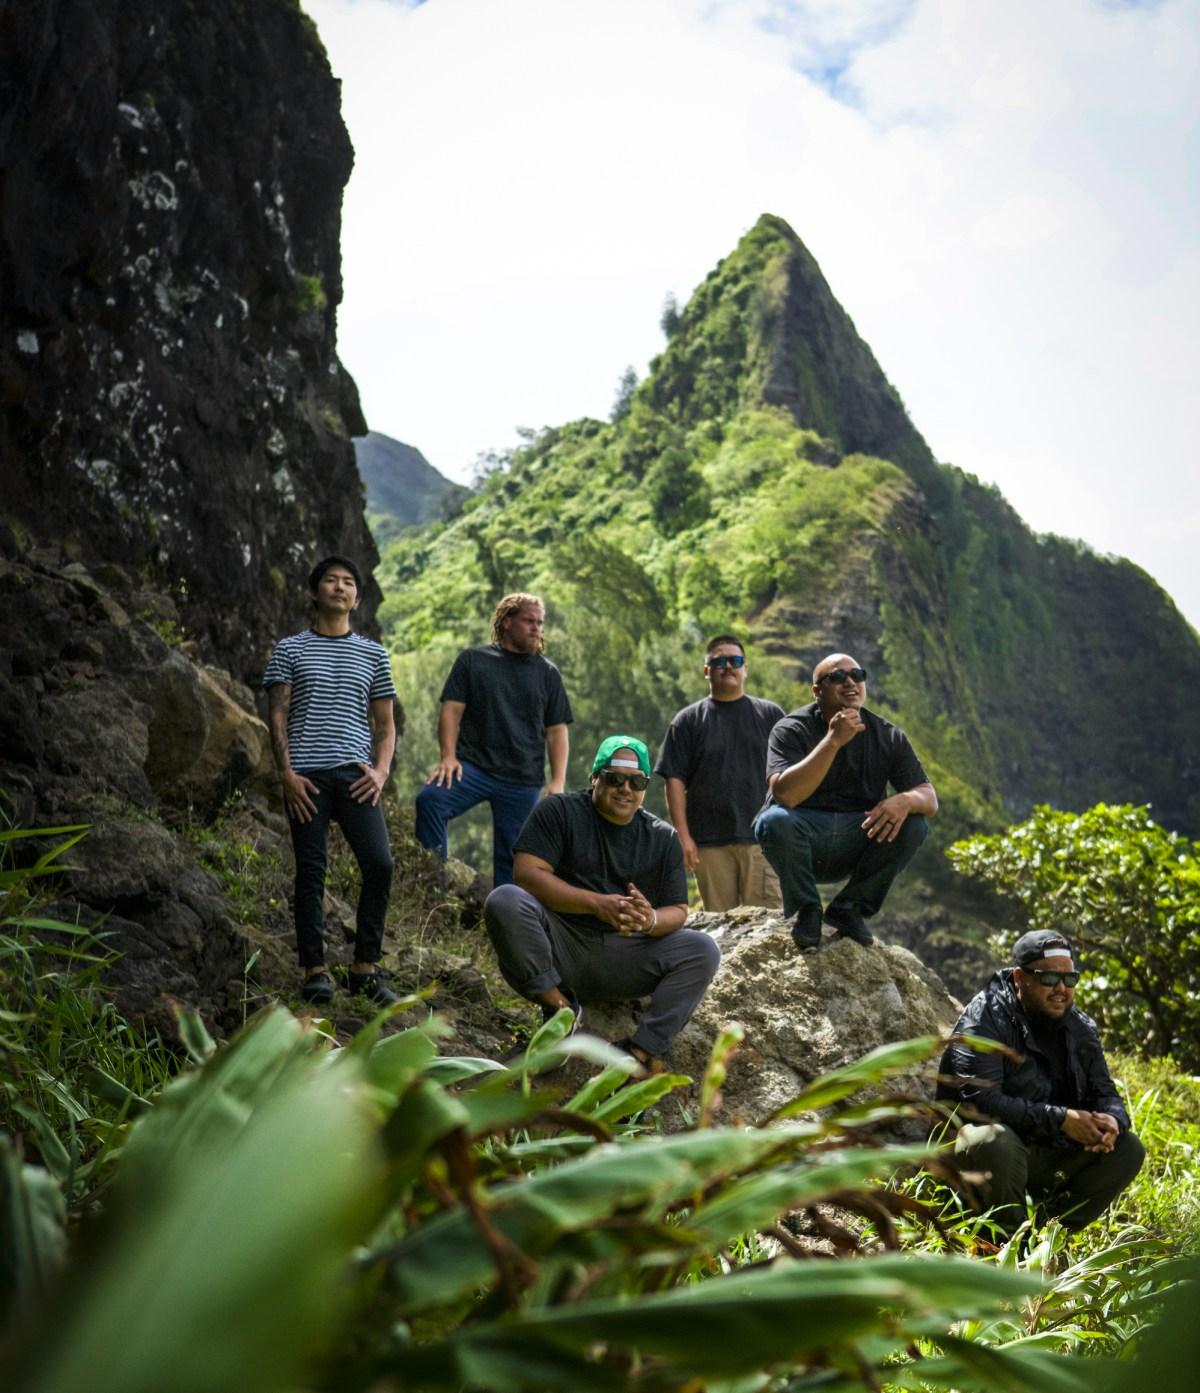 The Green Audio Ambassadors of Aloha